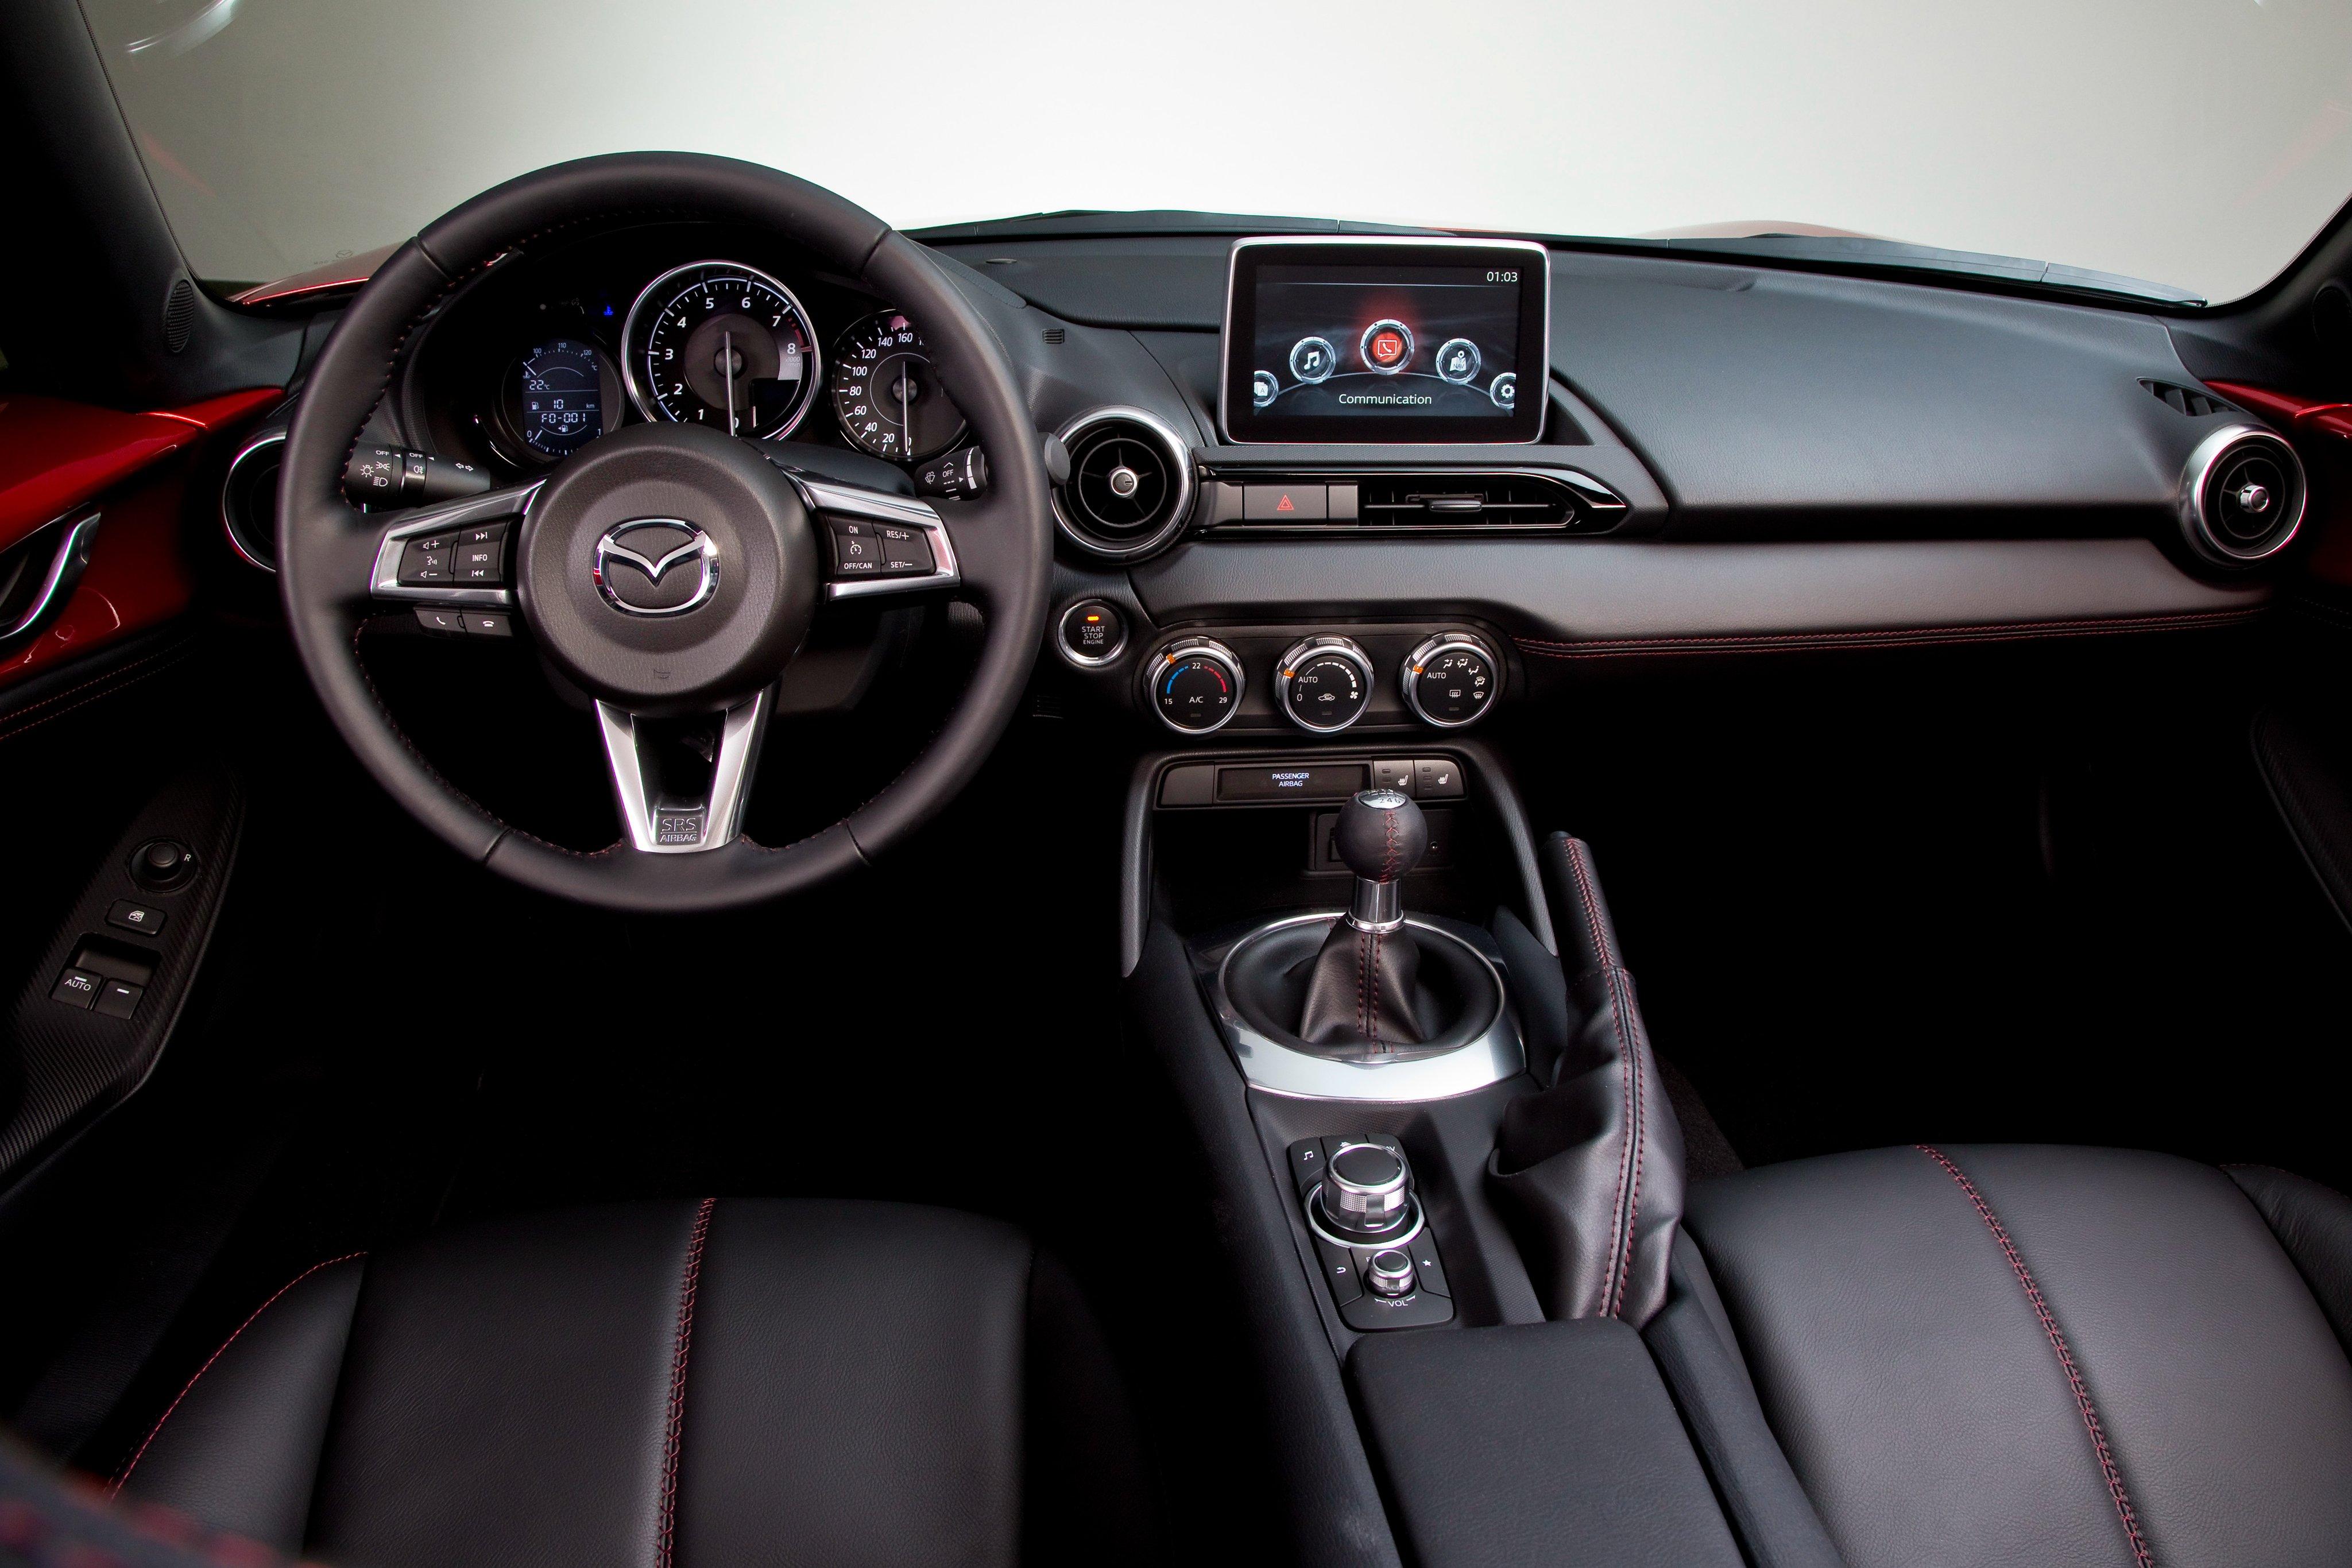 Mazda 5 2017 Interior >> 2015 Mazda MX-5 (N-D) roadster wallpaper | 4096x2731 | 492762 | WallpaperUP